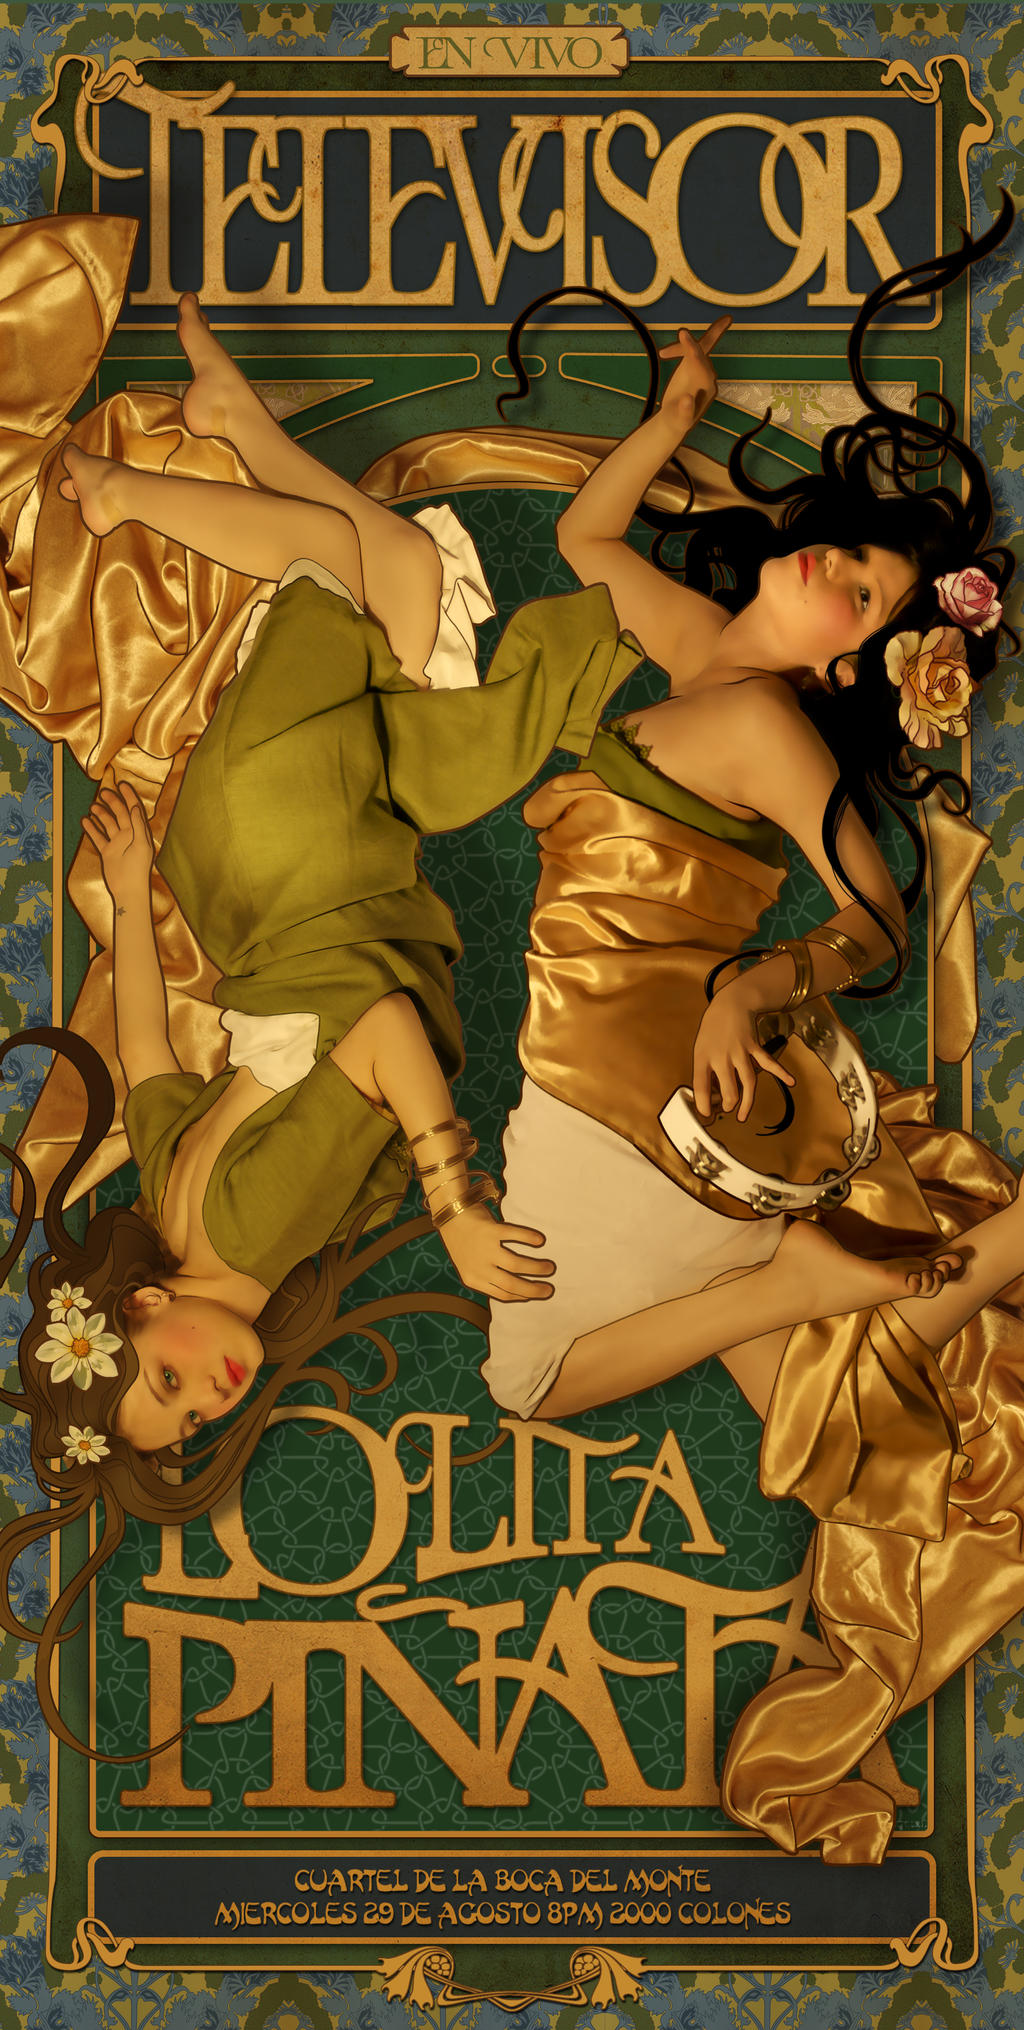 Lolita Pinata y Televisor